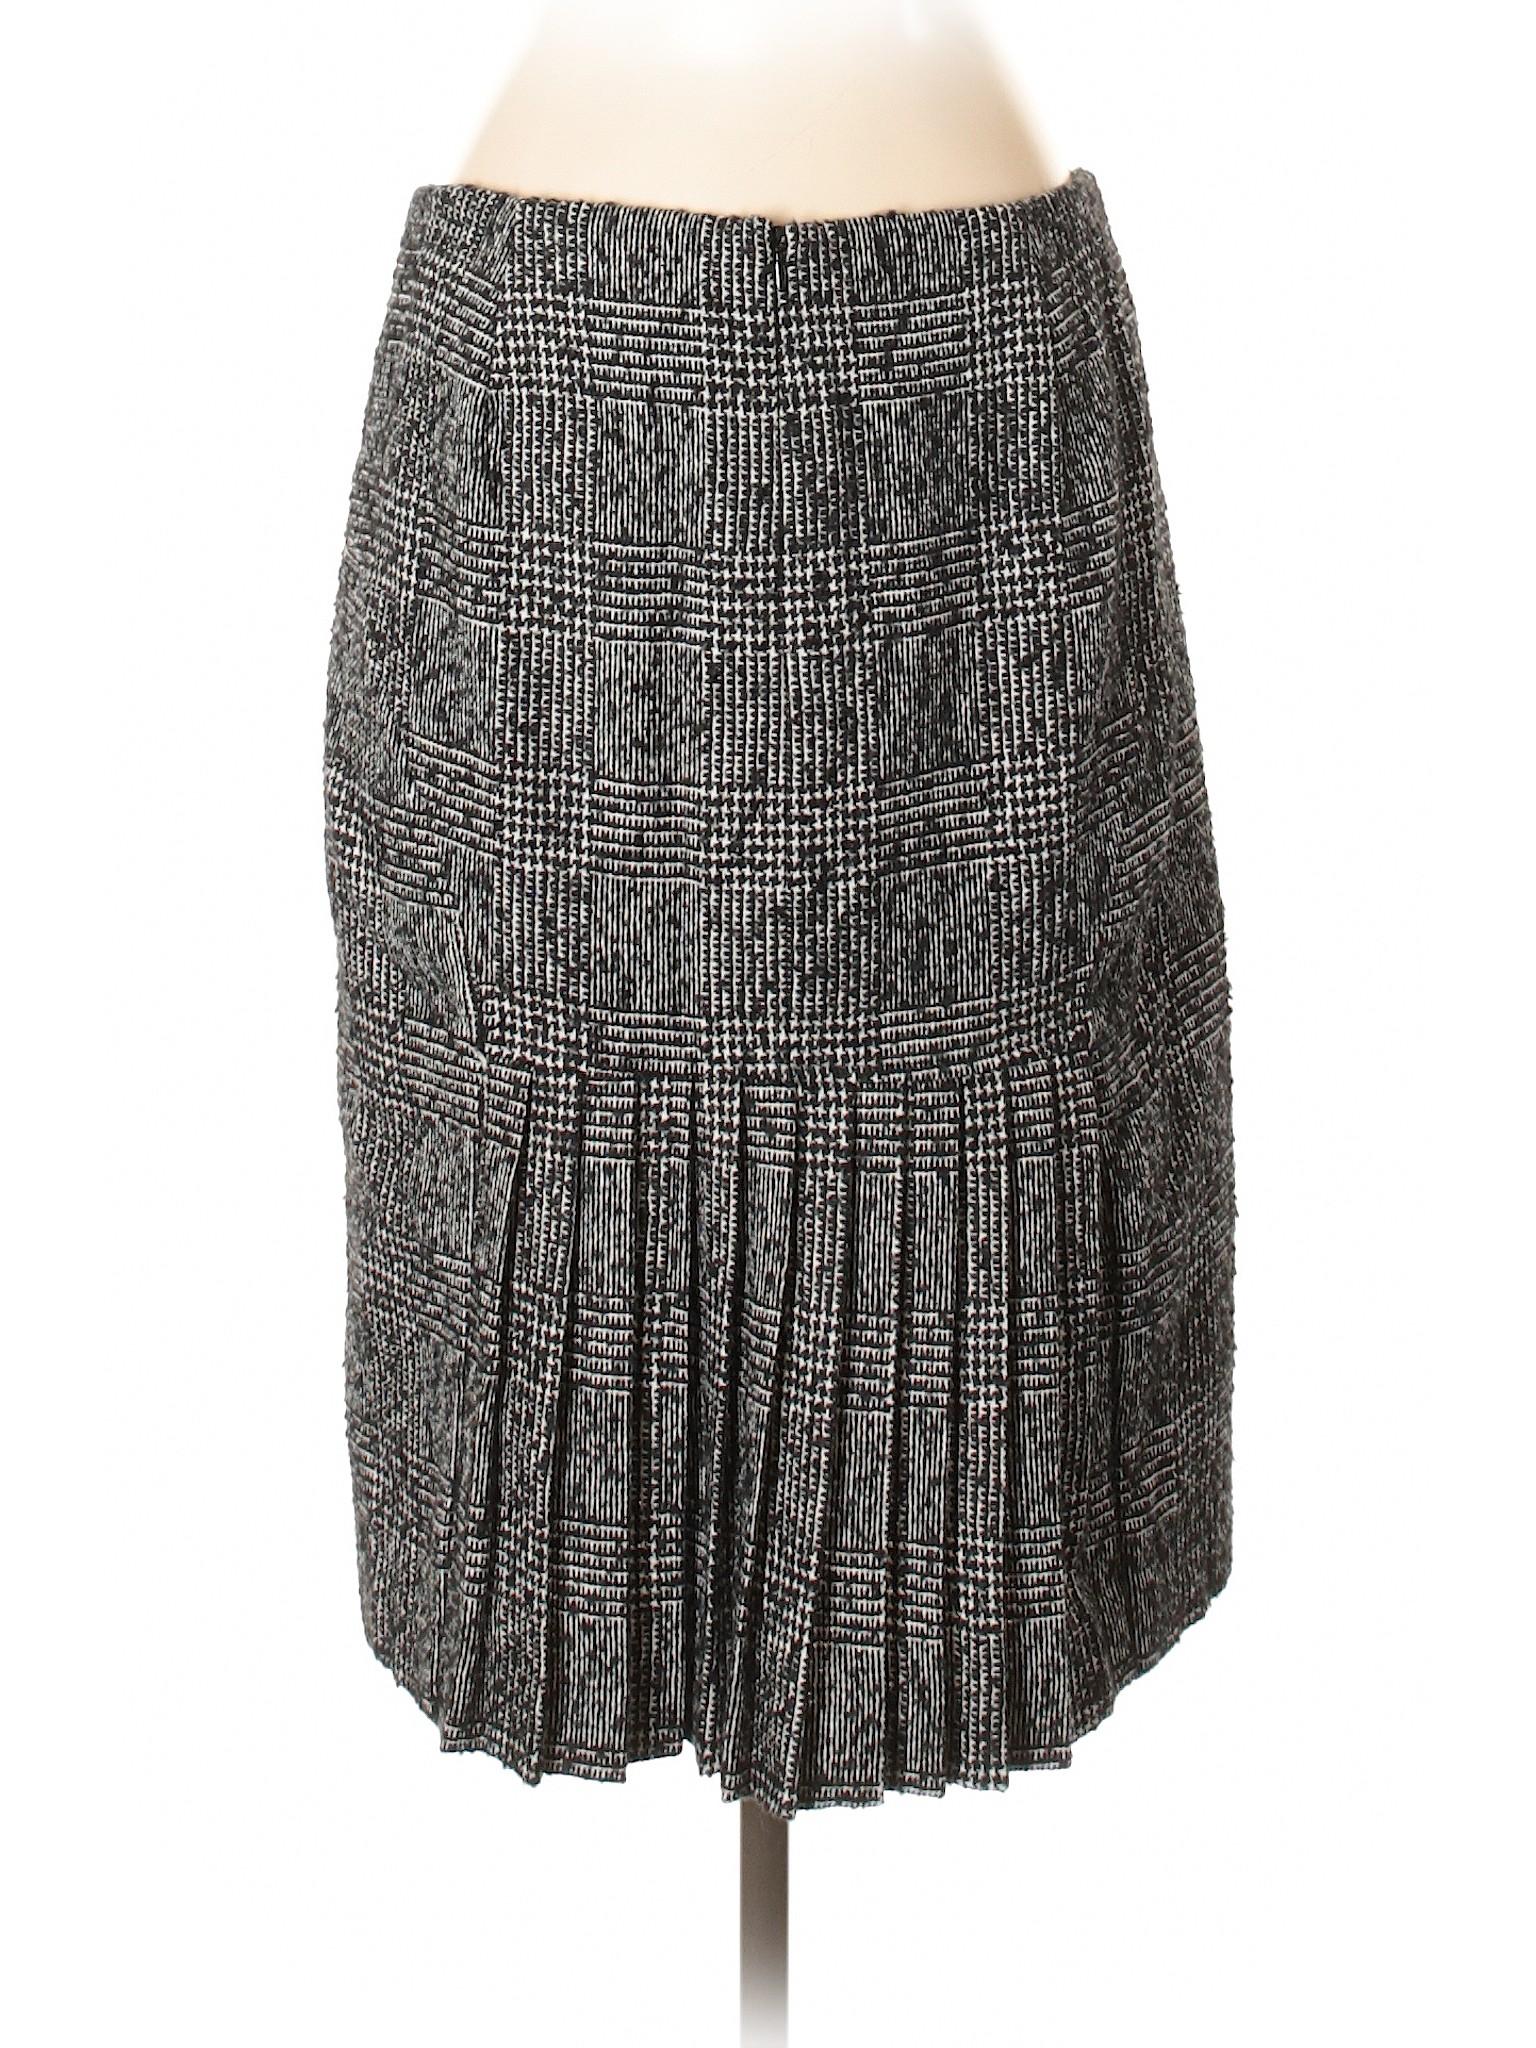 Design Skirt Studio Express leisure Boutique Casual na7HE6BBF